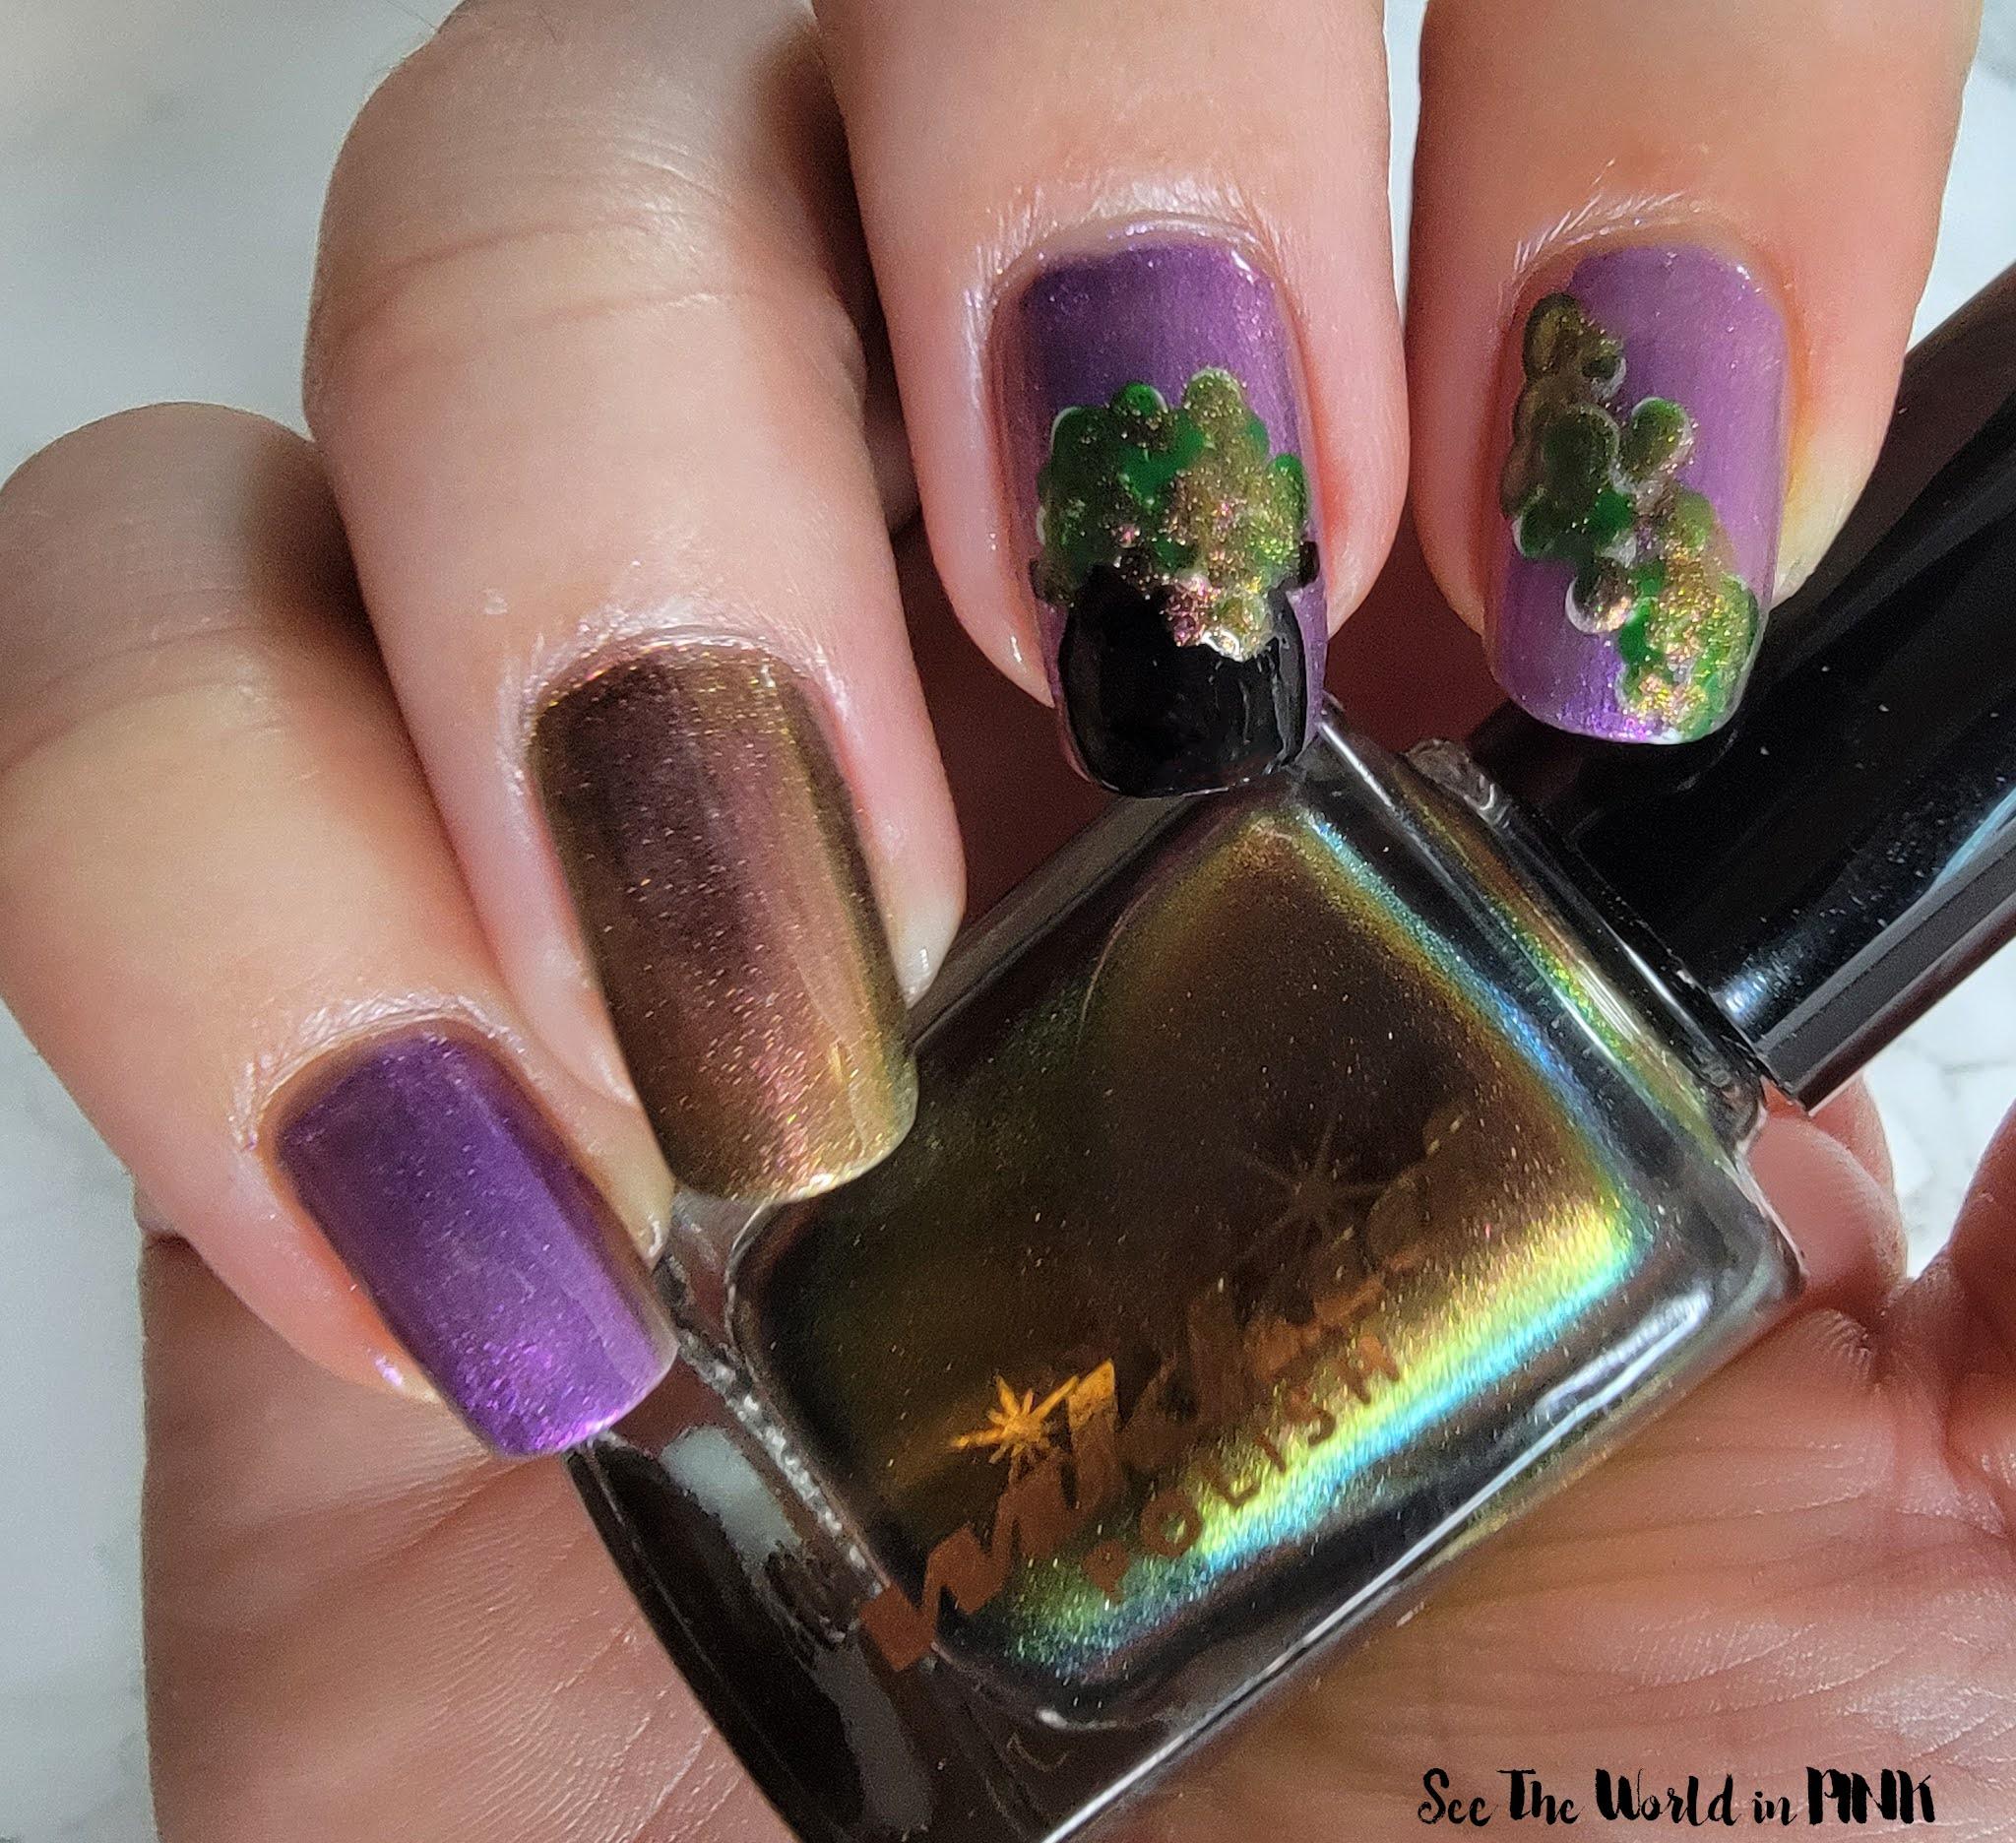 Manicure Monday - Witch's Cauldron Nails